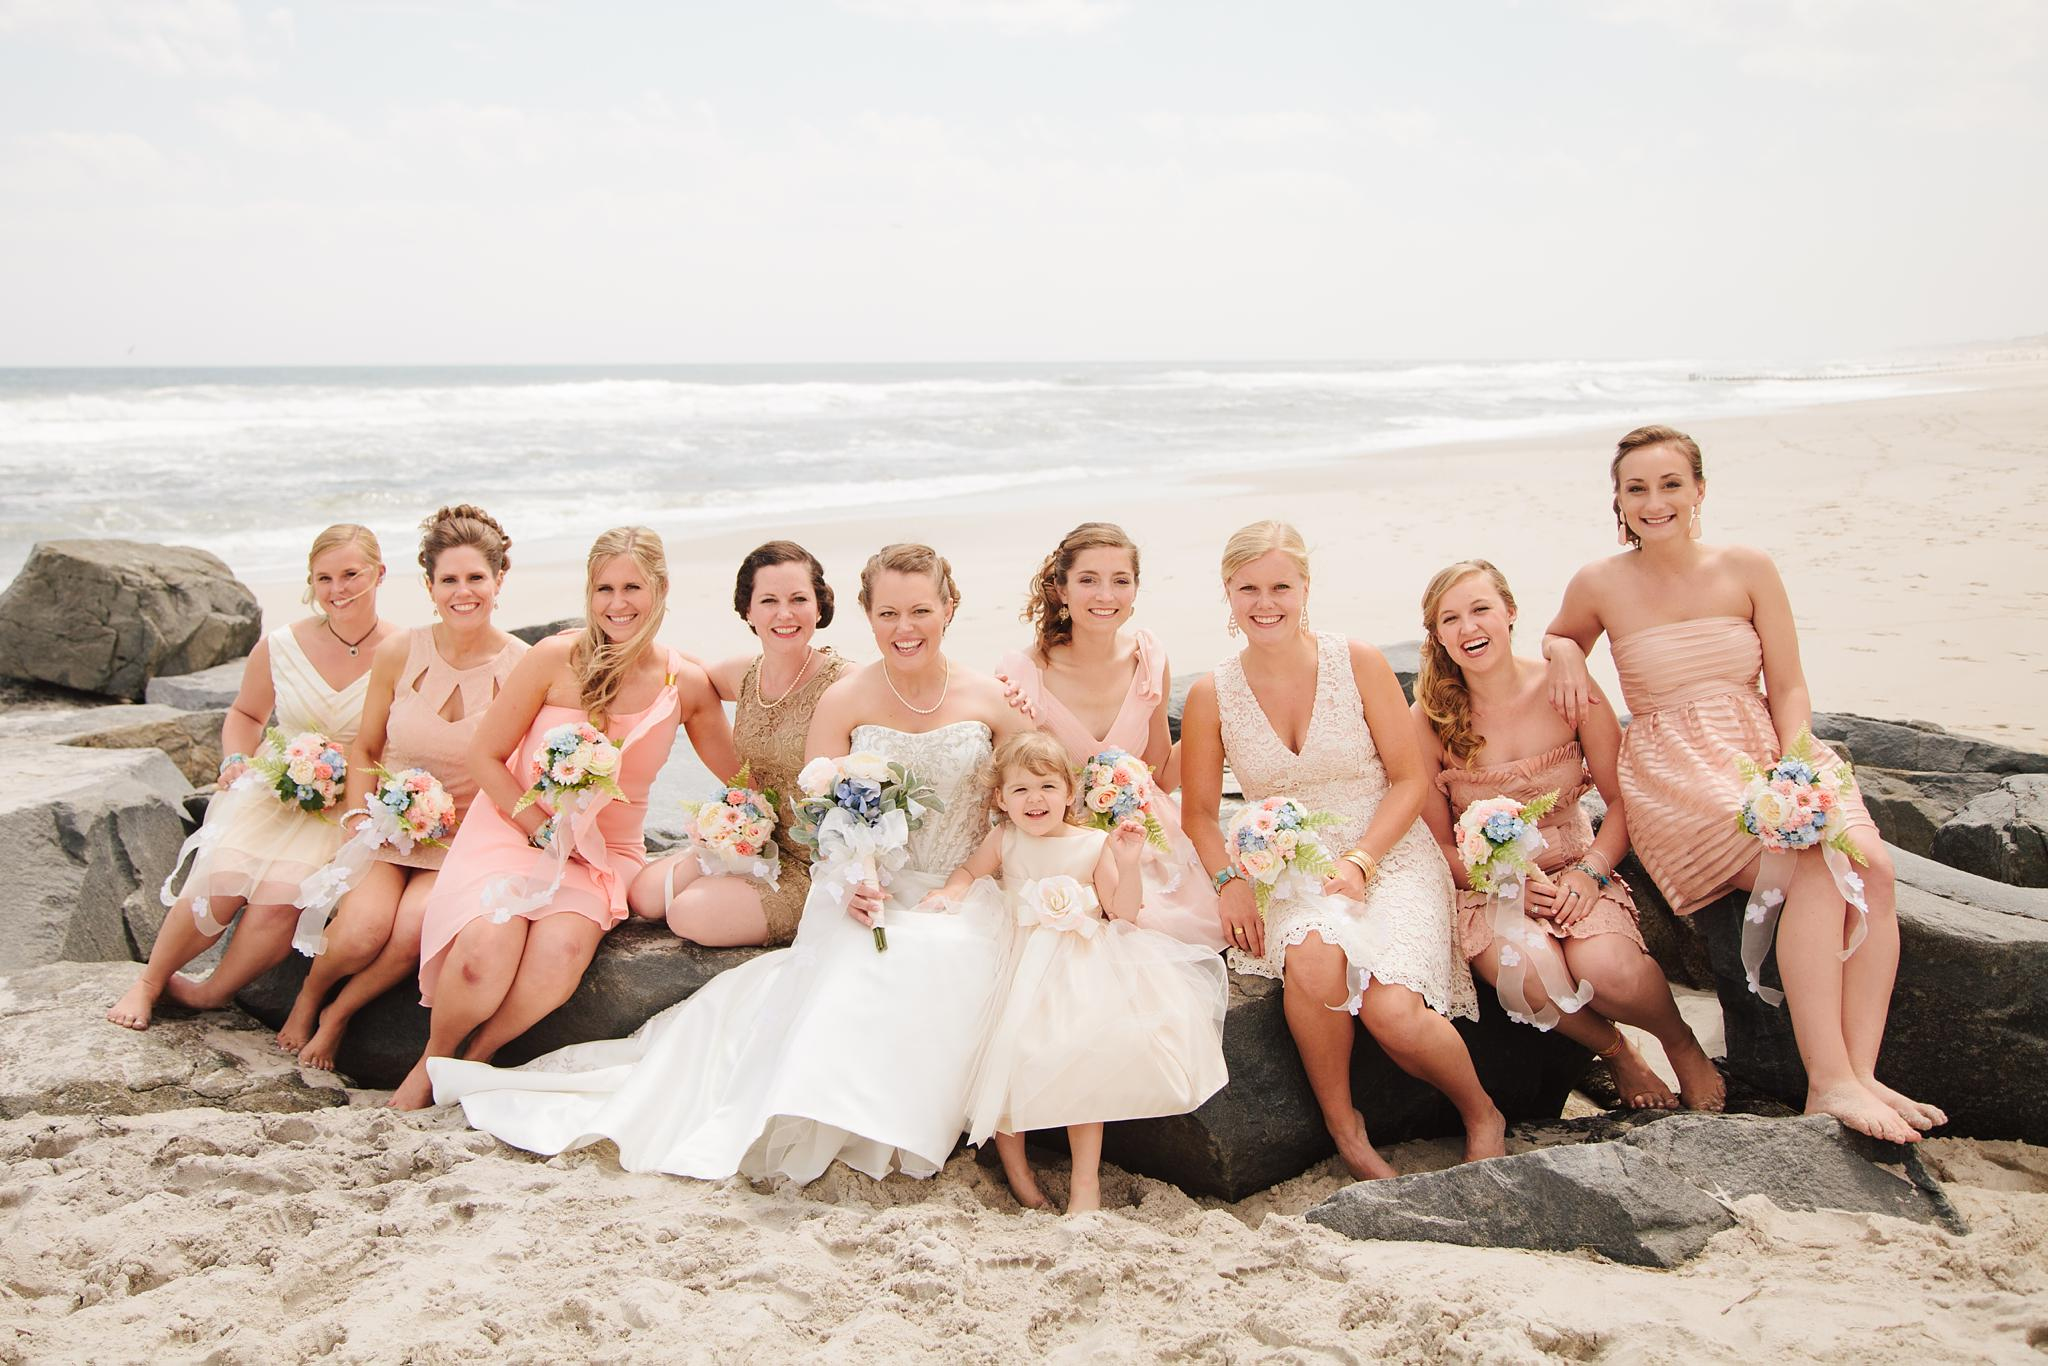 brant_beach_yacht_club_wedding_long_beach_island_nj_wedding_photographer_159.jpg